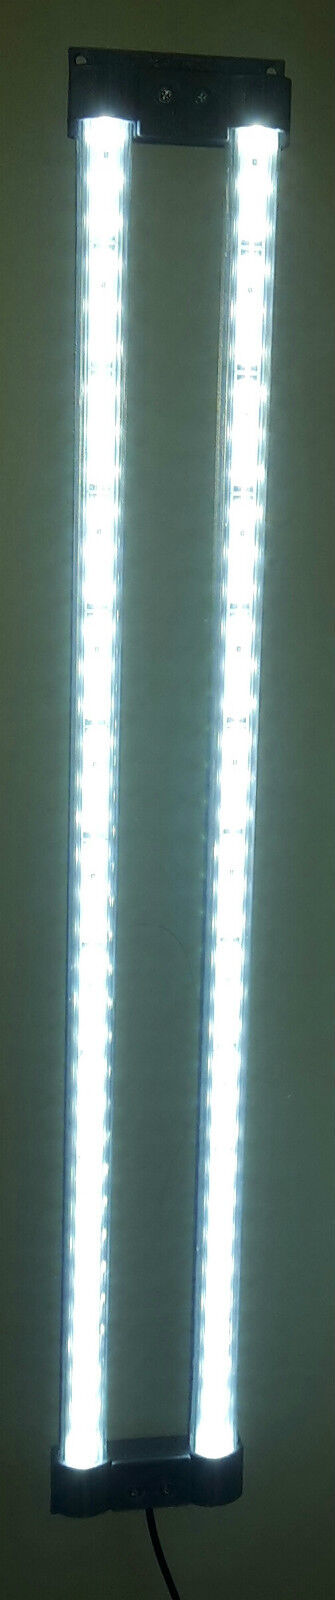 Aquarium Dual alloy LED light 104cm long high brightness daylight 6500K